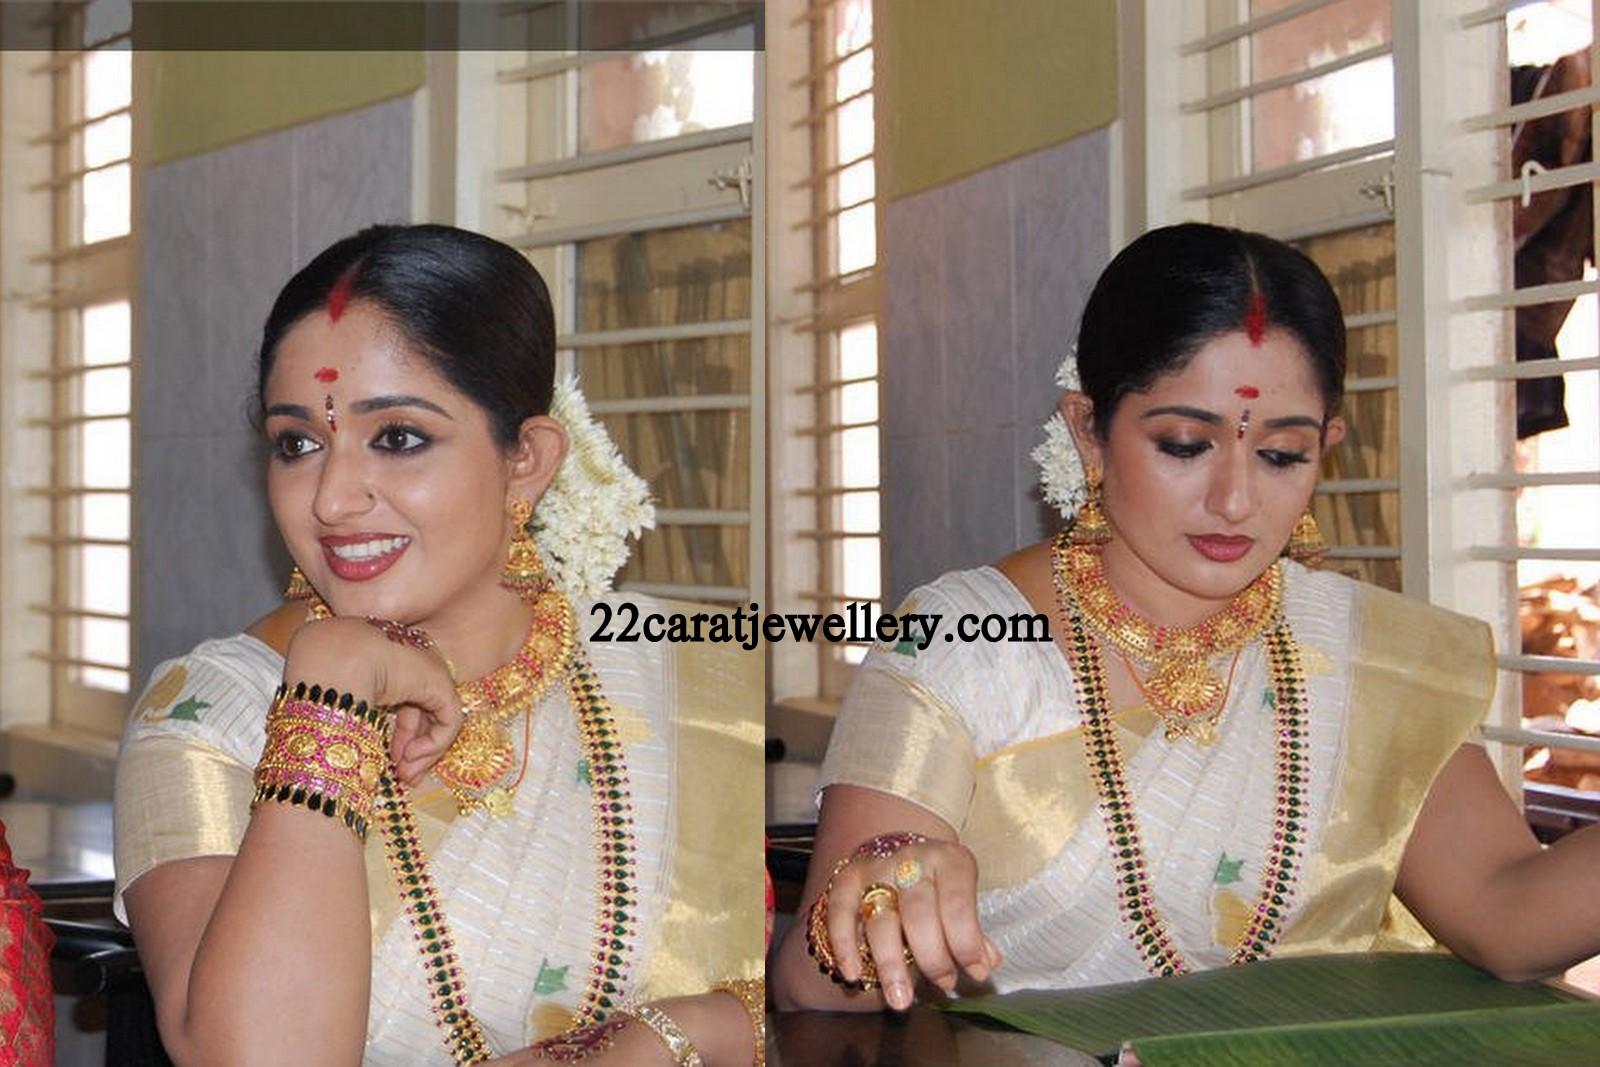 Marriage ornaments - South Indian Actress Kavya Madhavan Spotted With Beautiful 22 Carat Gold Tarditional Mango Mala Studded With Rubys And Emralds Gold Kau Mala Kasula Peru